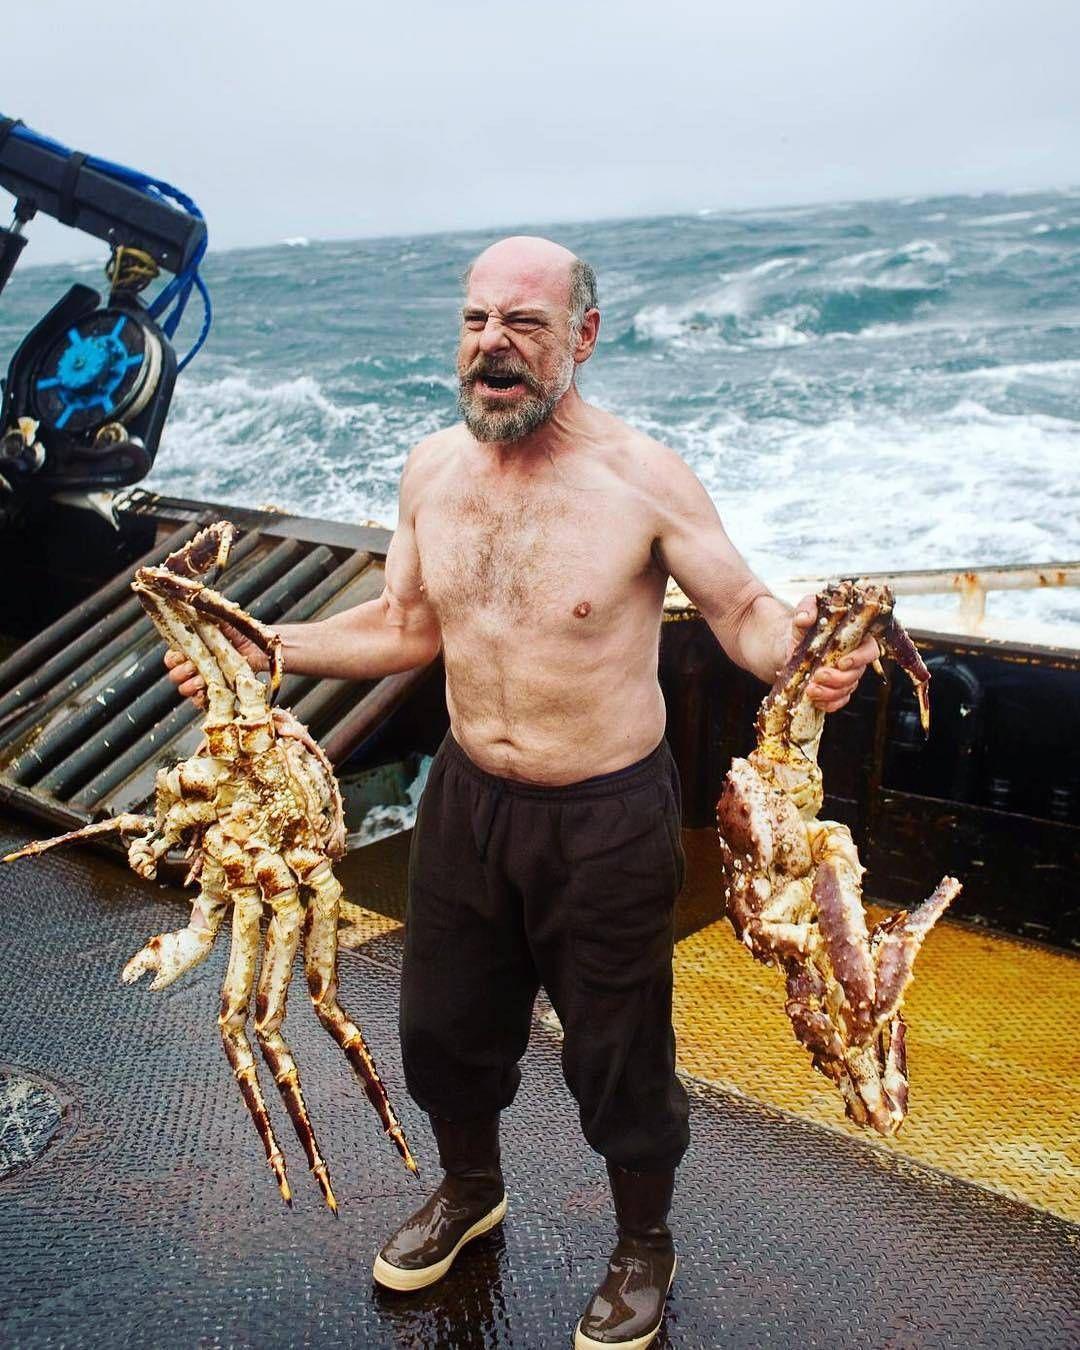 Dating a crab fisherman